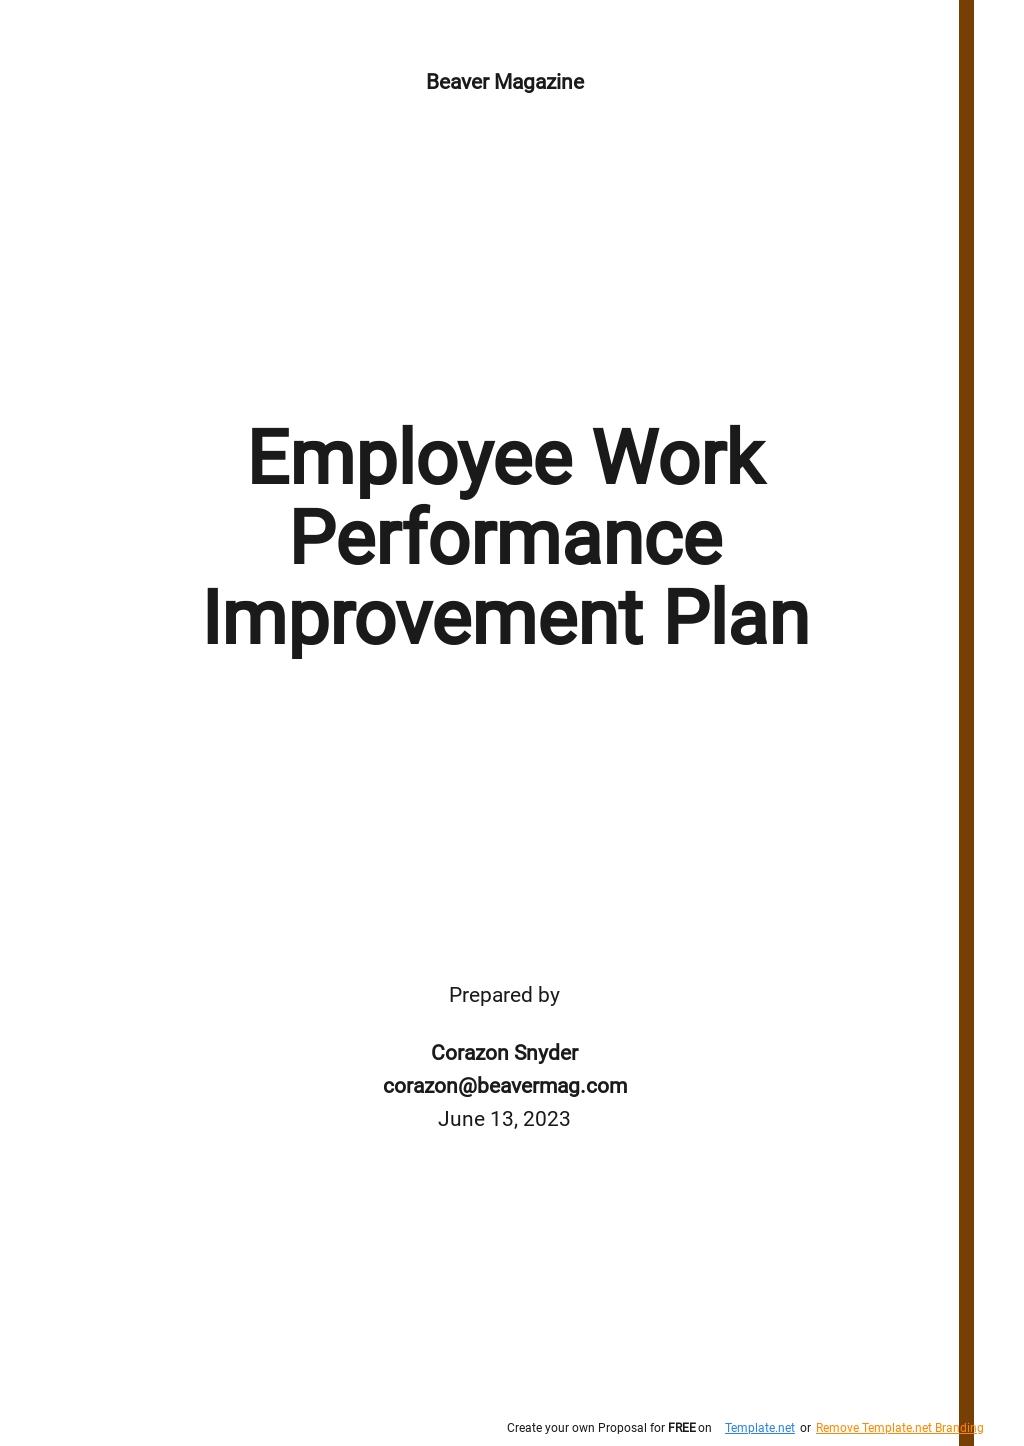 Employee Work Performance Improvement Plan Template.jpe